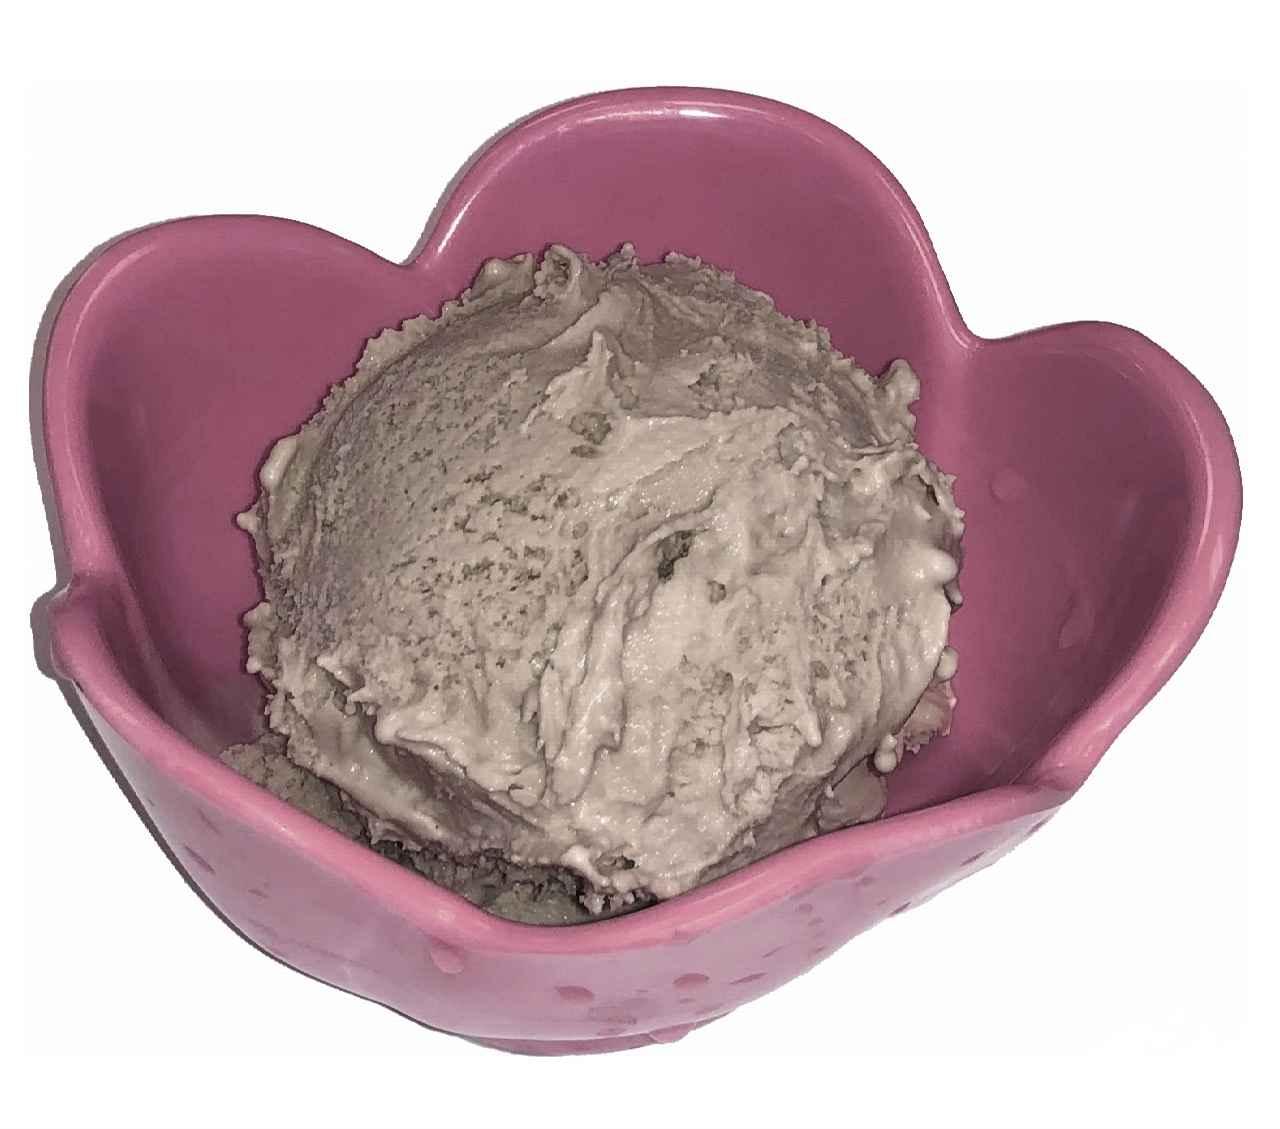 23. Coconut Ice Cream